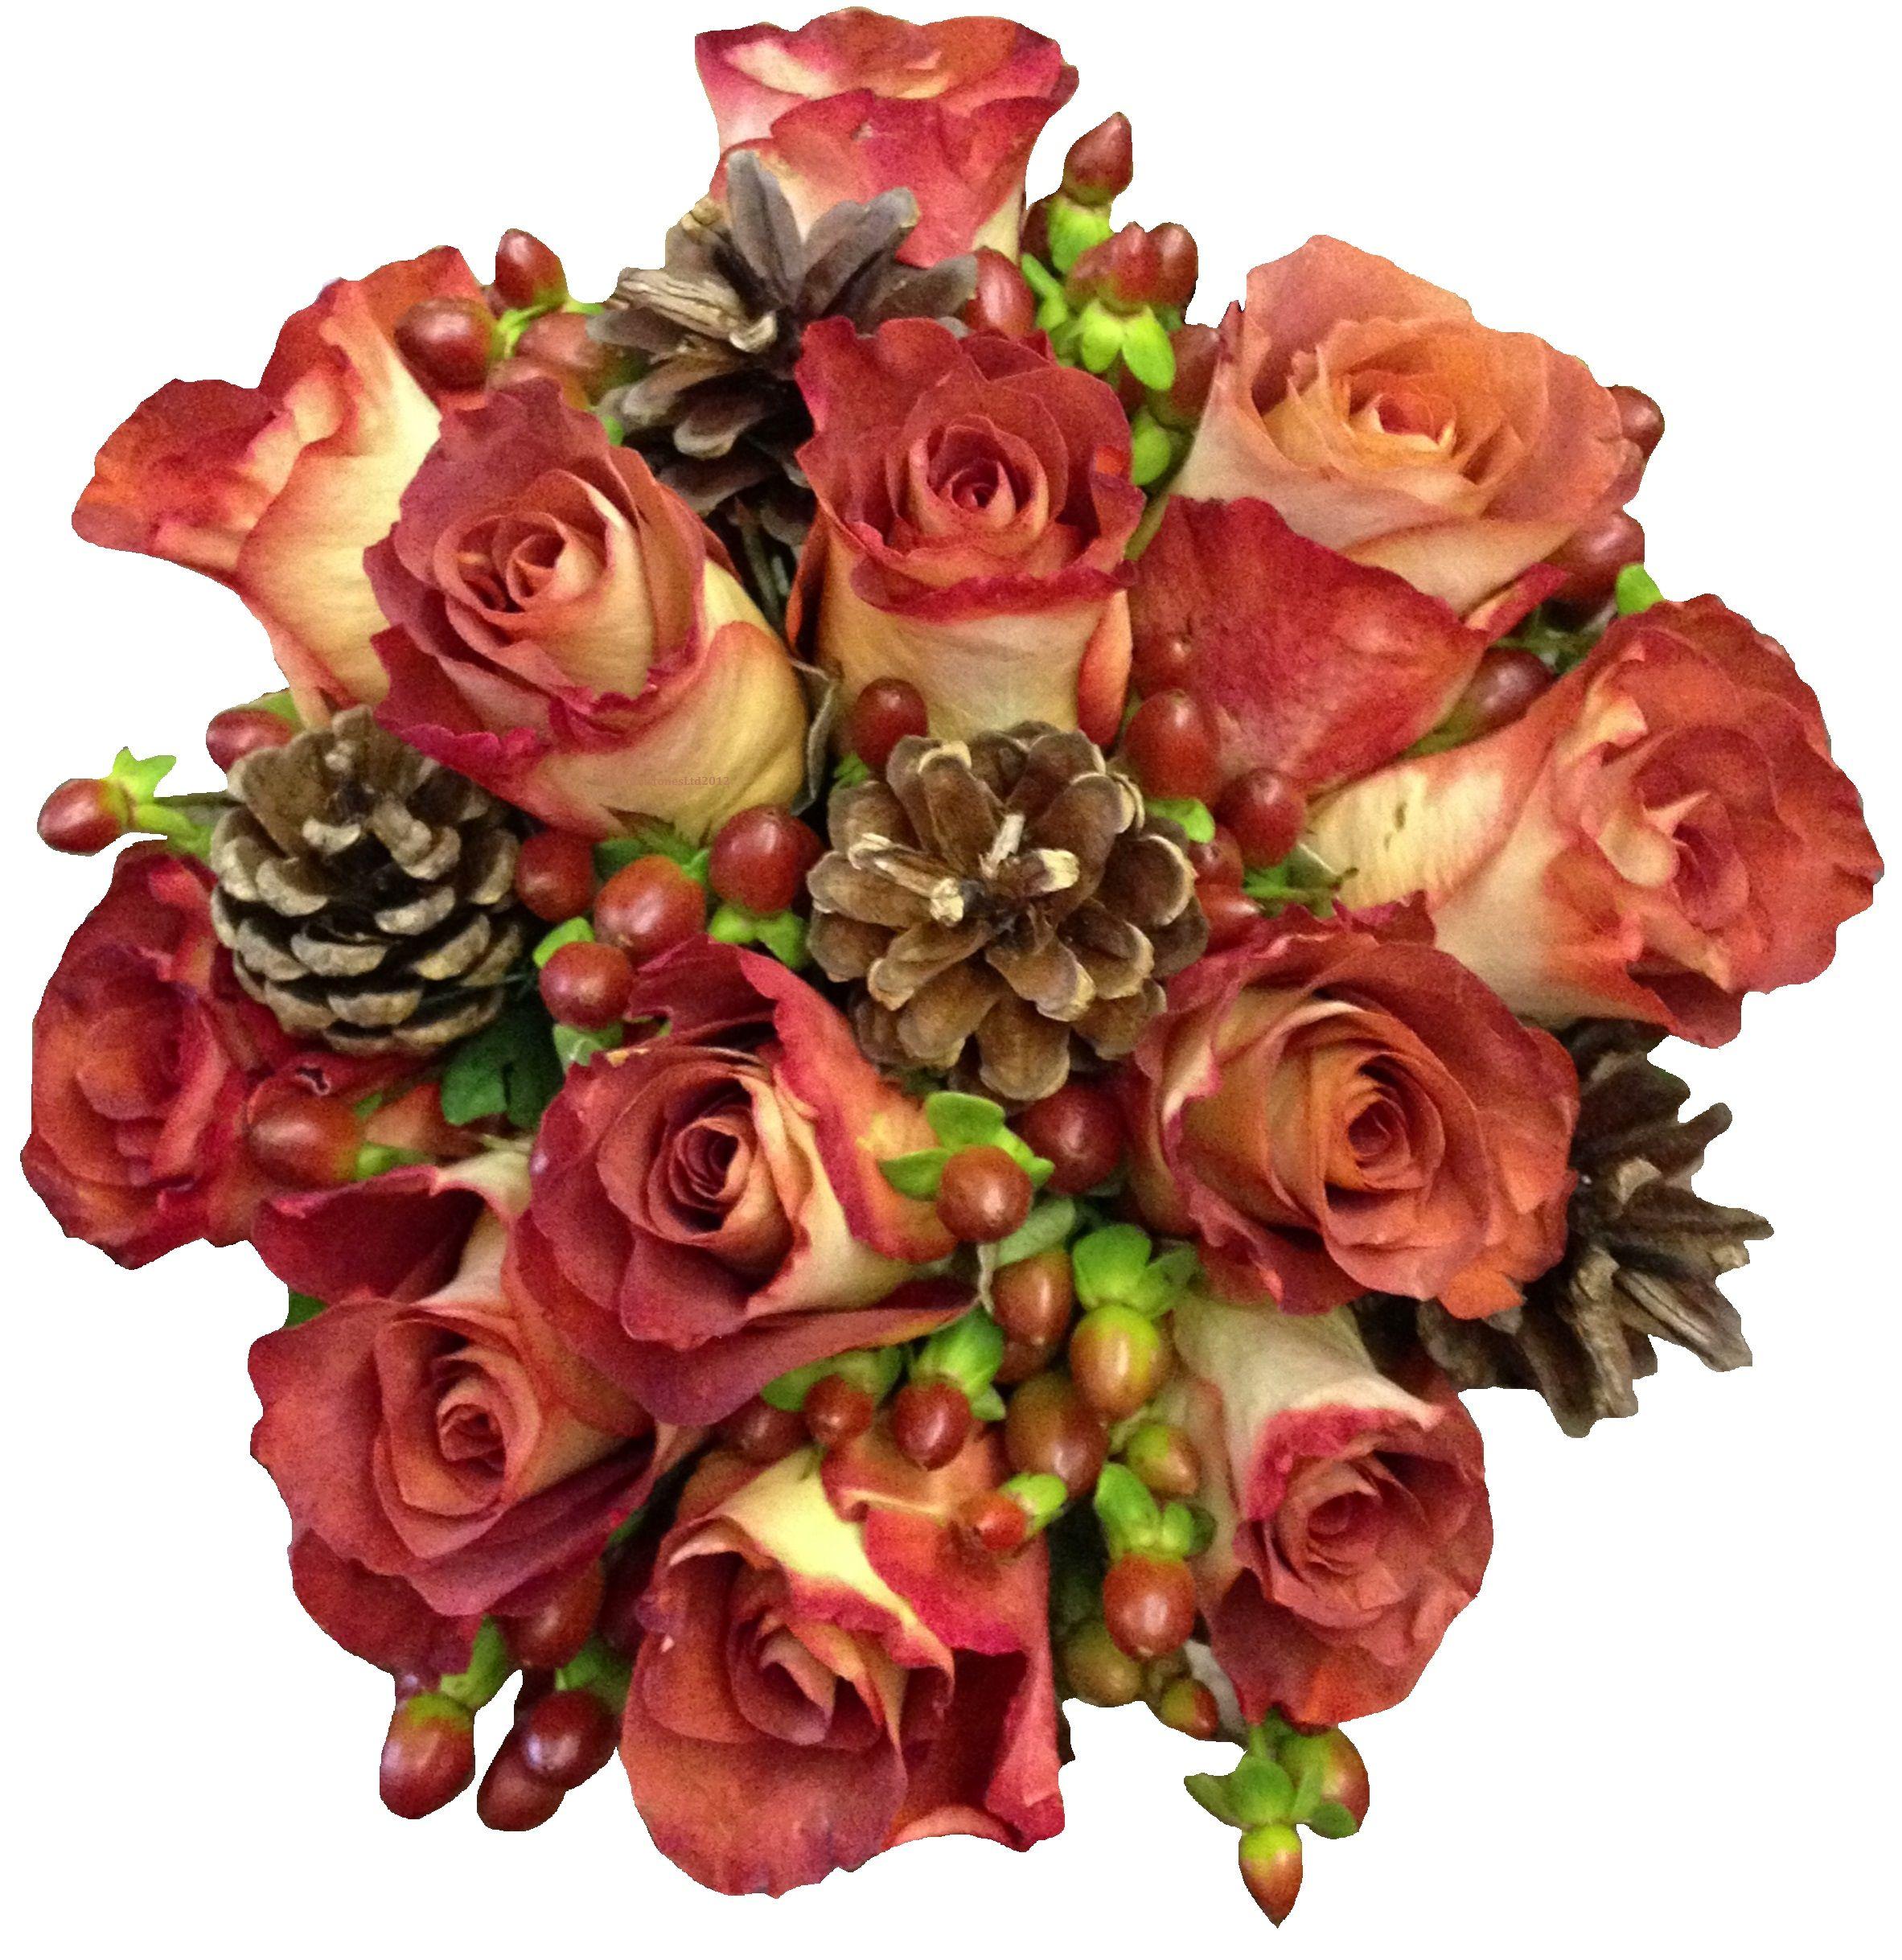 Wedding Flowers Lincoln: Leonardis Roses, Hypericum And Pine Cones